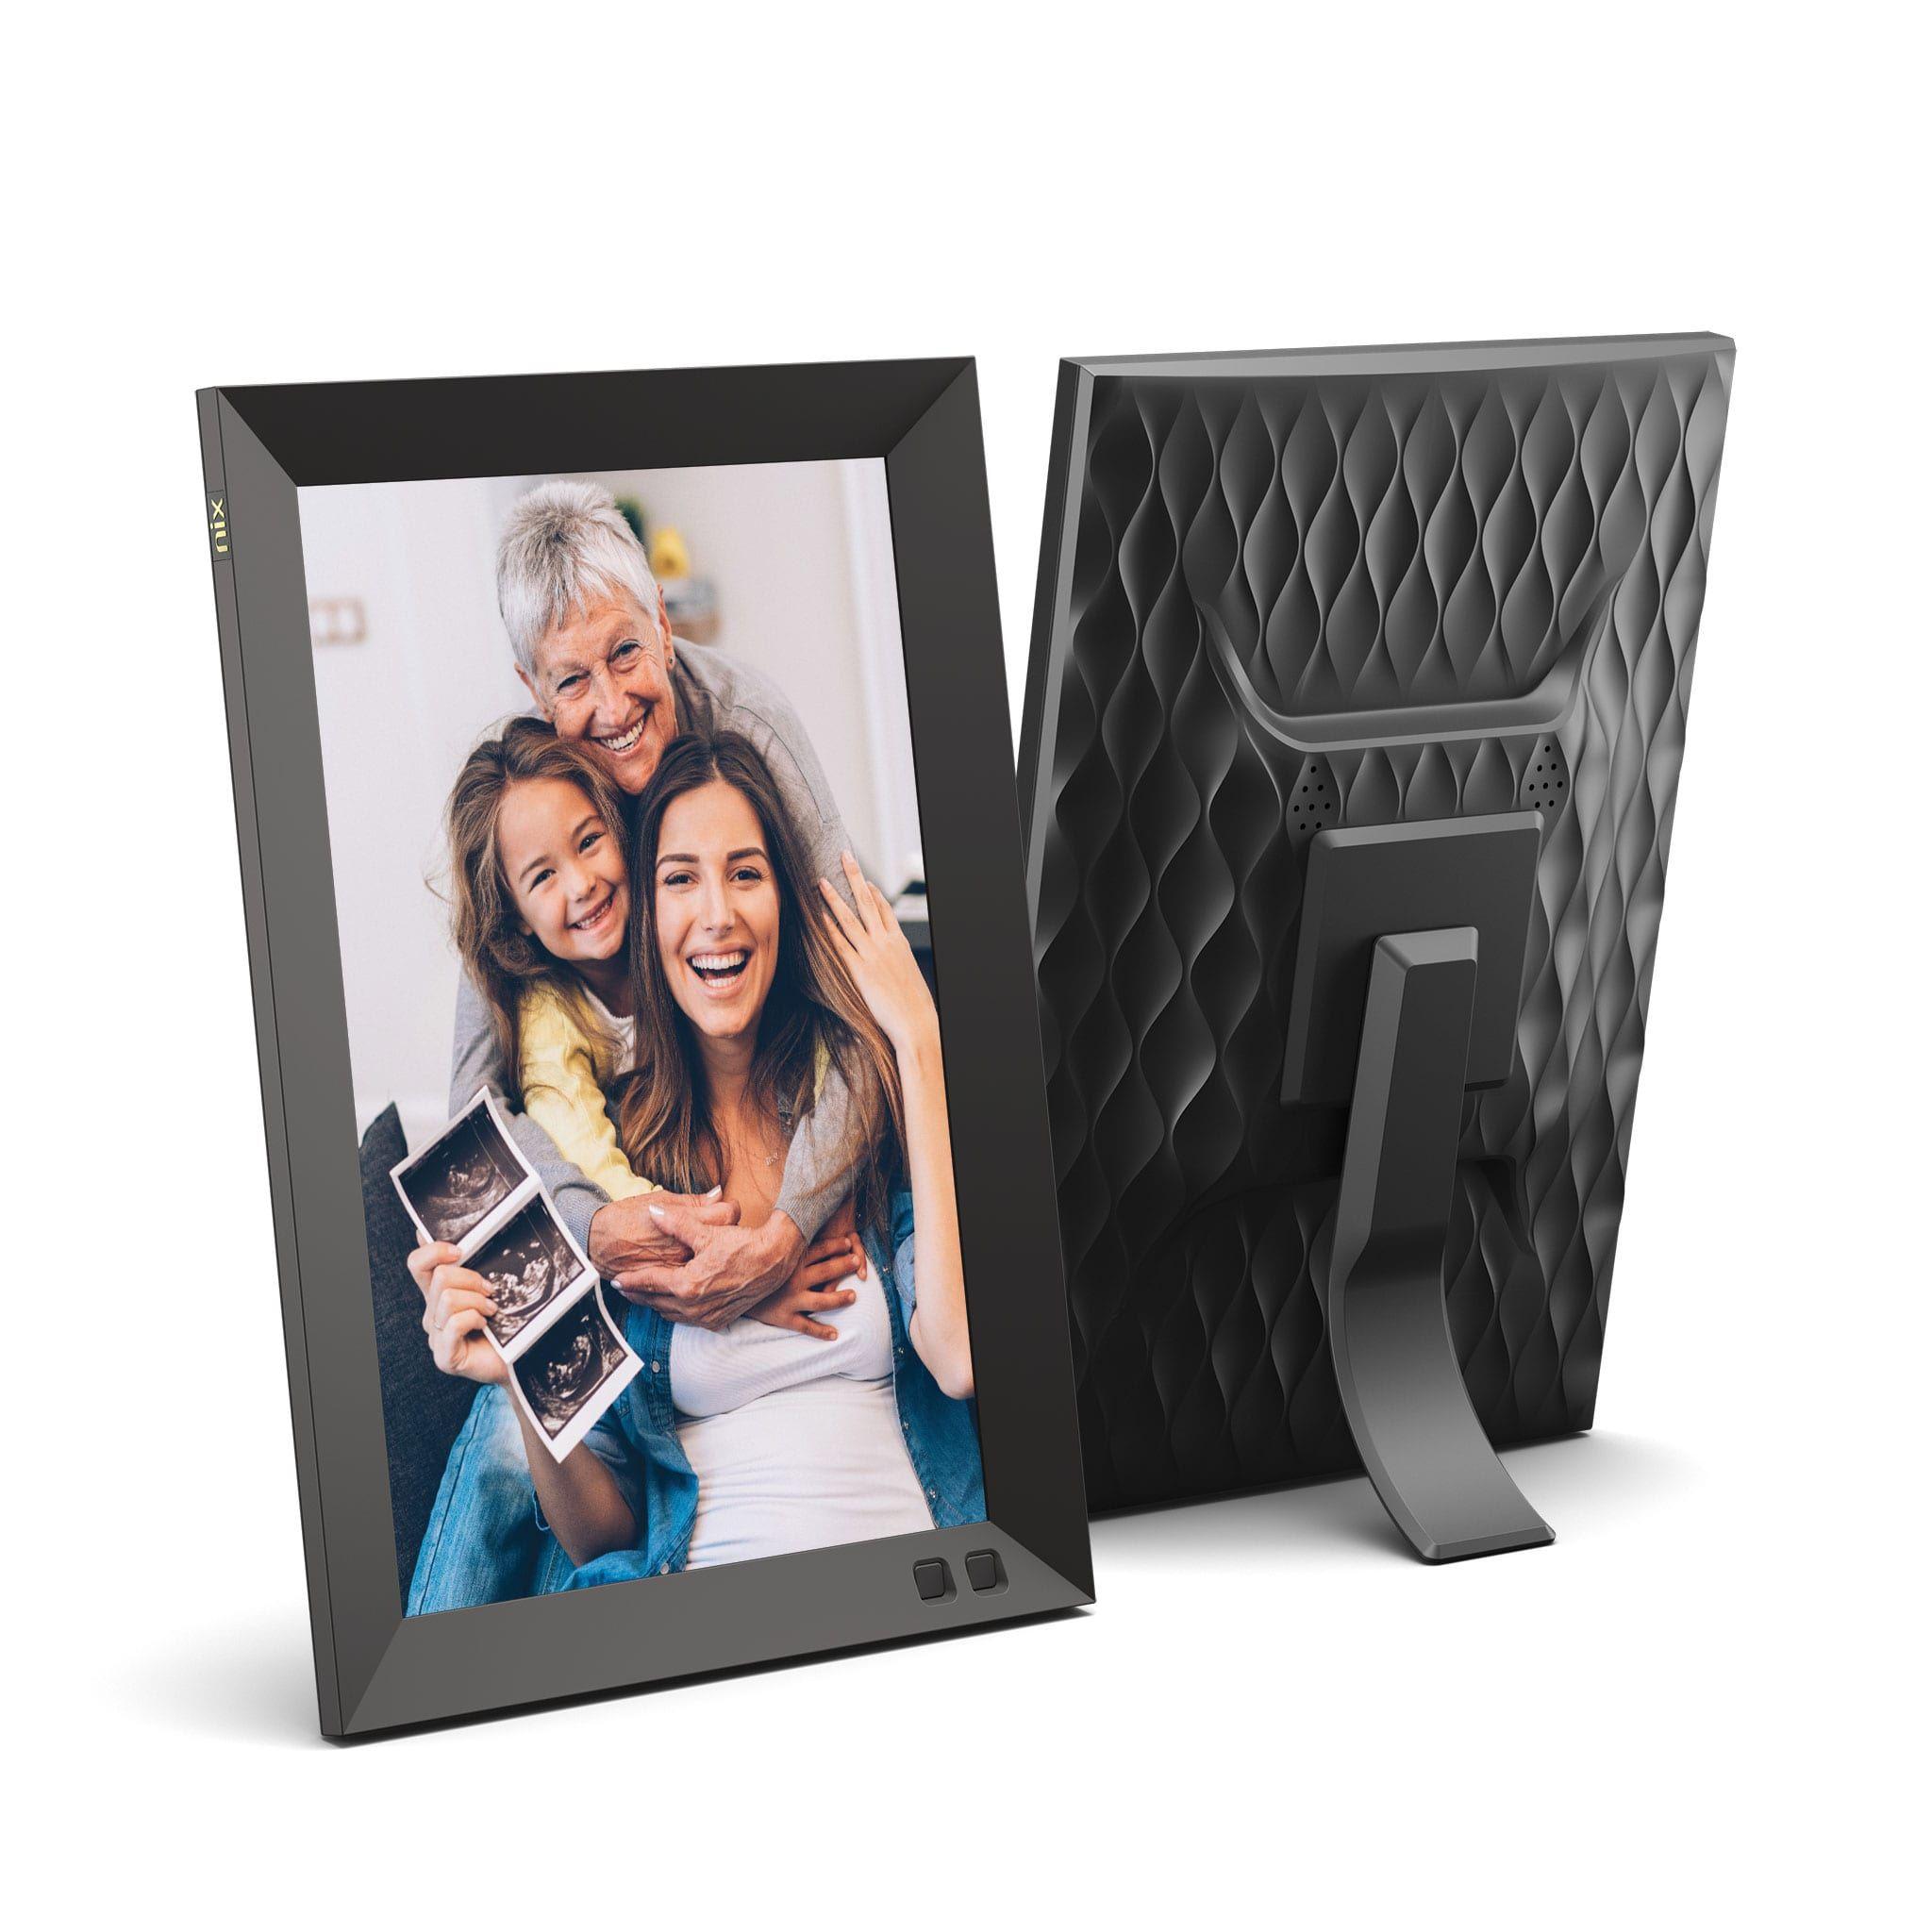 Nix 10 1 Wall Mountable Hd Digital Photo Frame With Auto Rotate And Motion Sensor Walmart Com Digital Picture Frame Digital Photo Frame Photo Frame